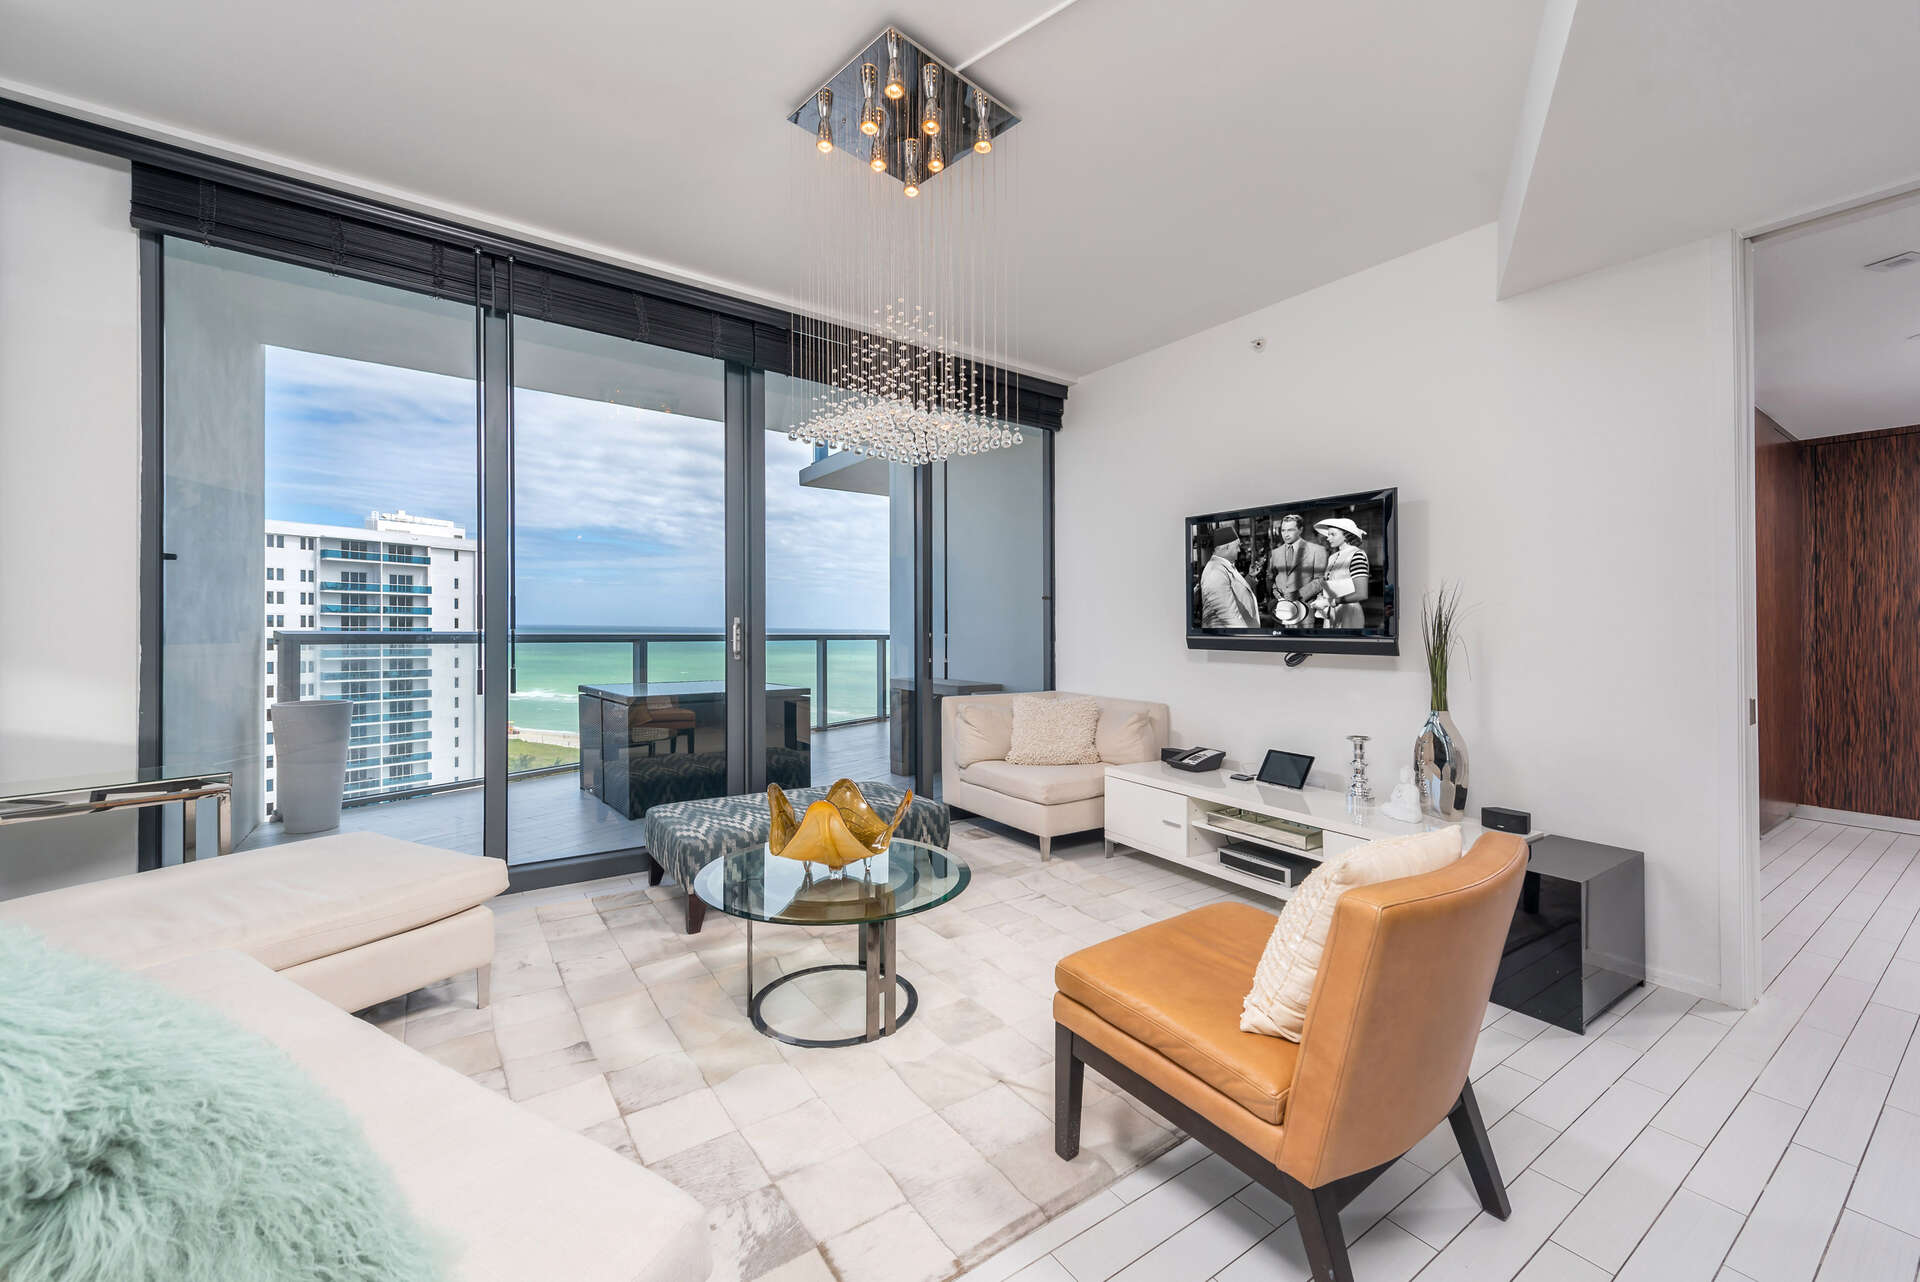 Luxury vacation rentals usa - Florida - Miami beach - W hotel south beach - #1411 | 2 BDM Ocean View - Image 1/13